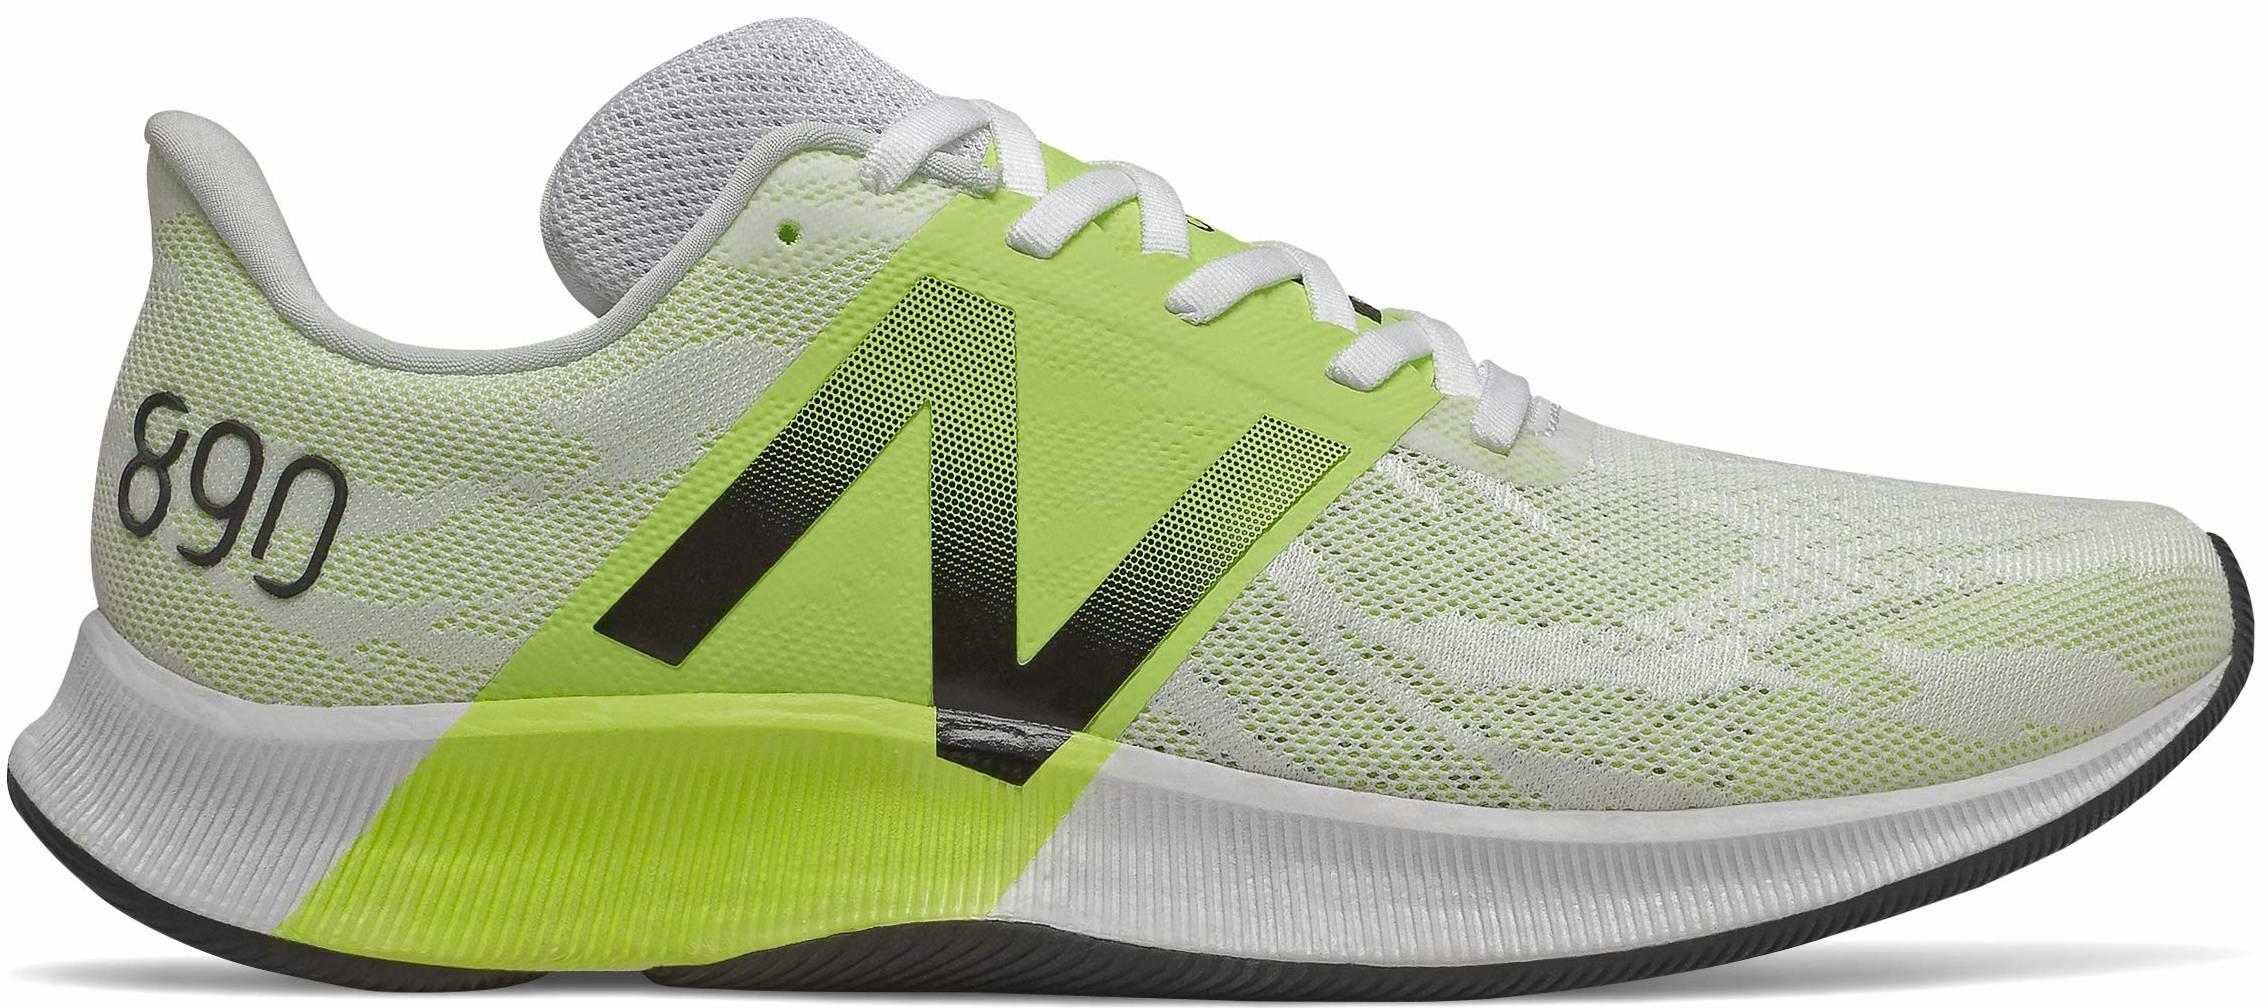 100 New Balance running shoes - Save 45% | RunRepeat